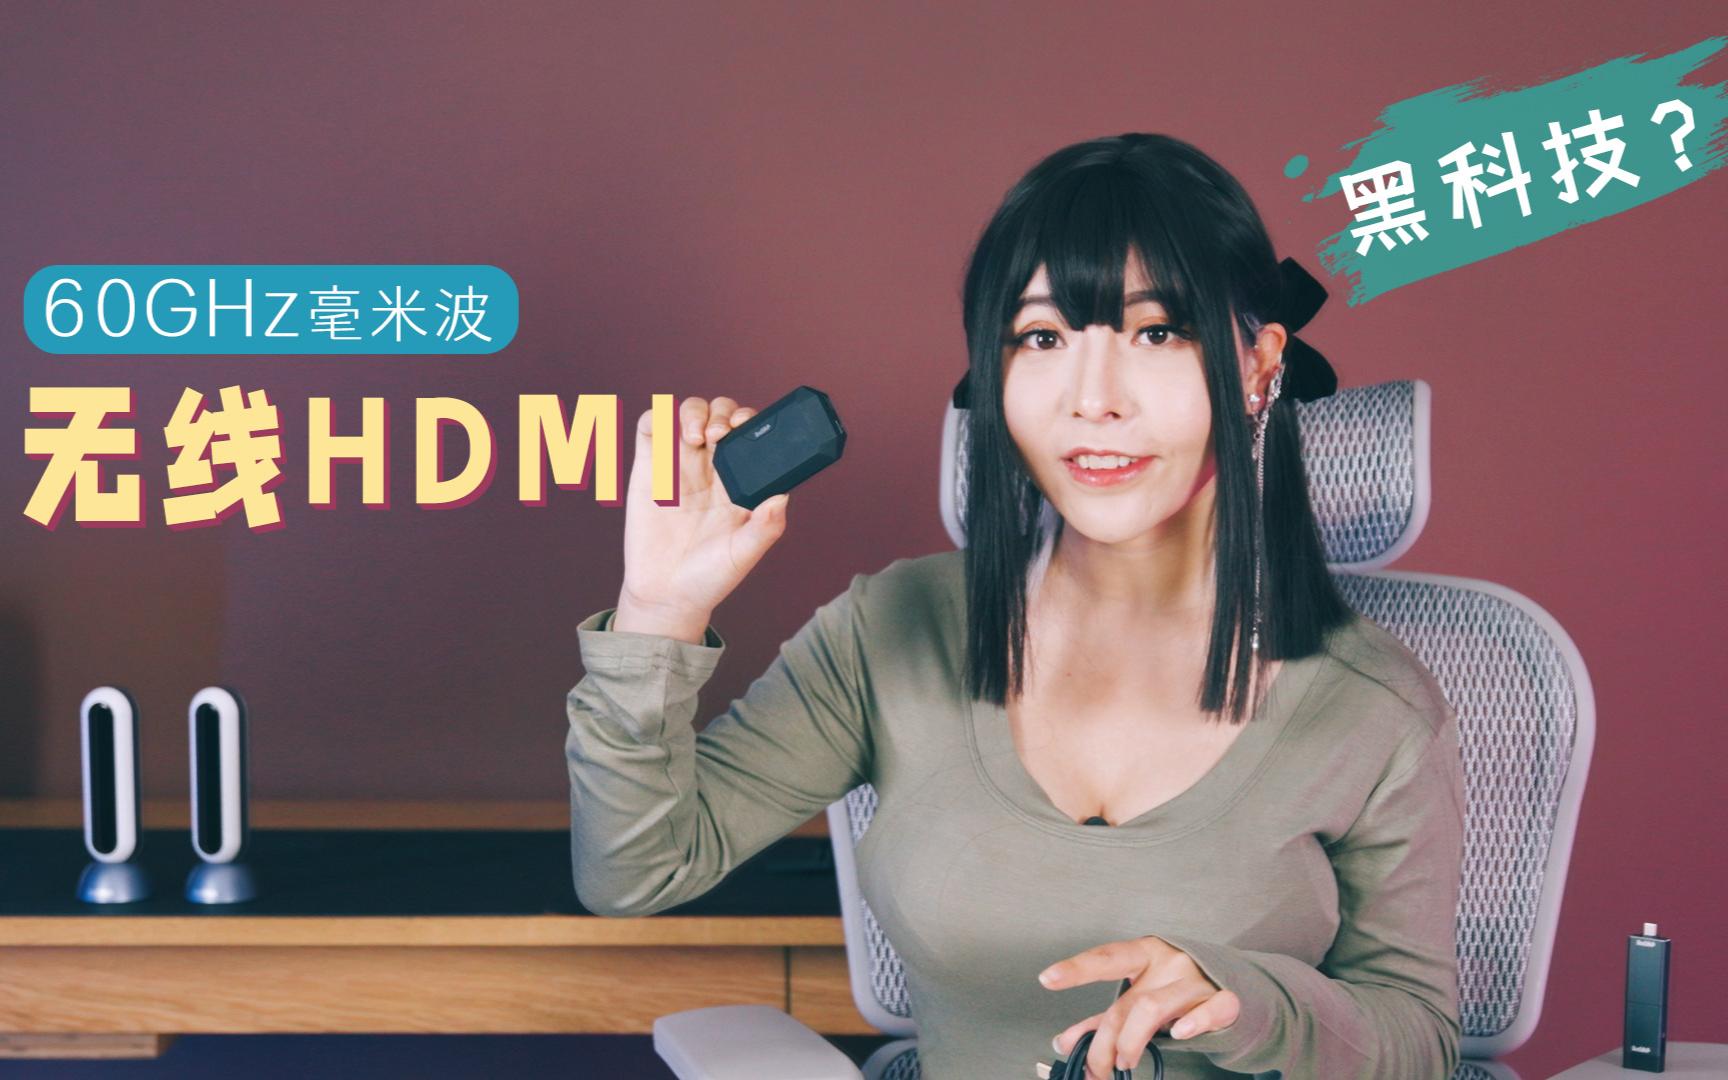 60GHz毫米波无线HDMI是黑科技?吊打WiFi无线投屏